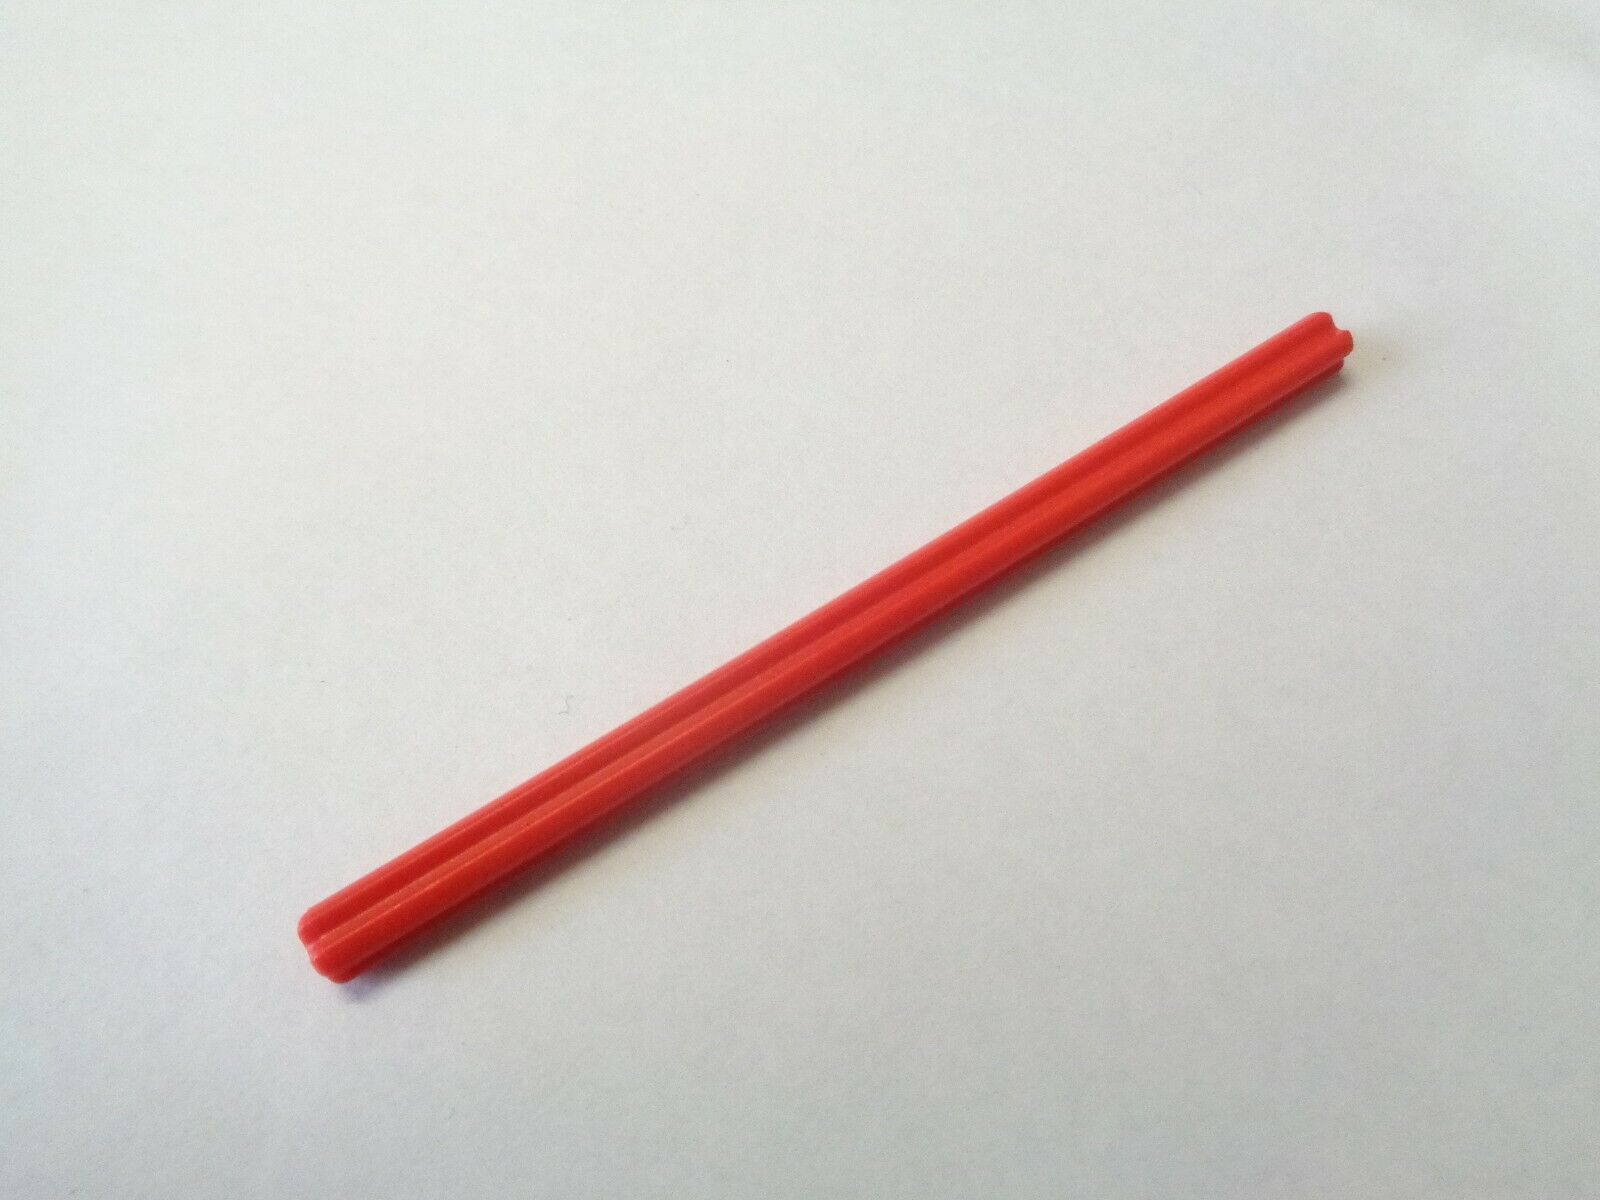 20 LEGO Technic Red Axle 4 Element 4143851 Design ID 3705 NEW